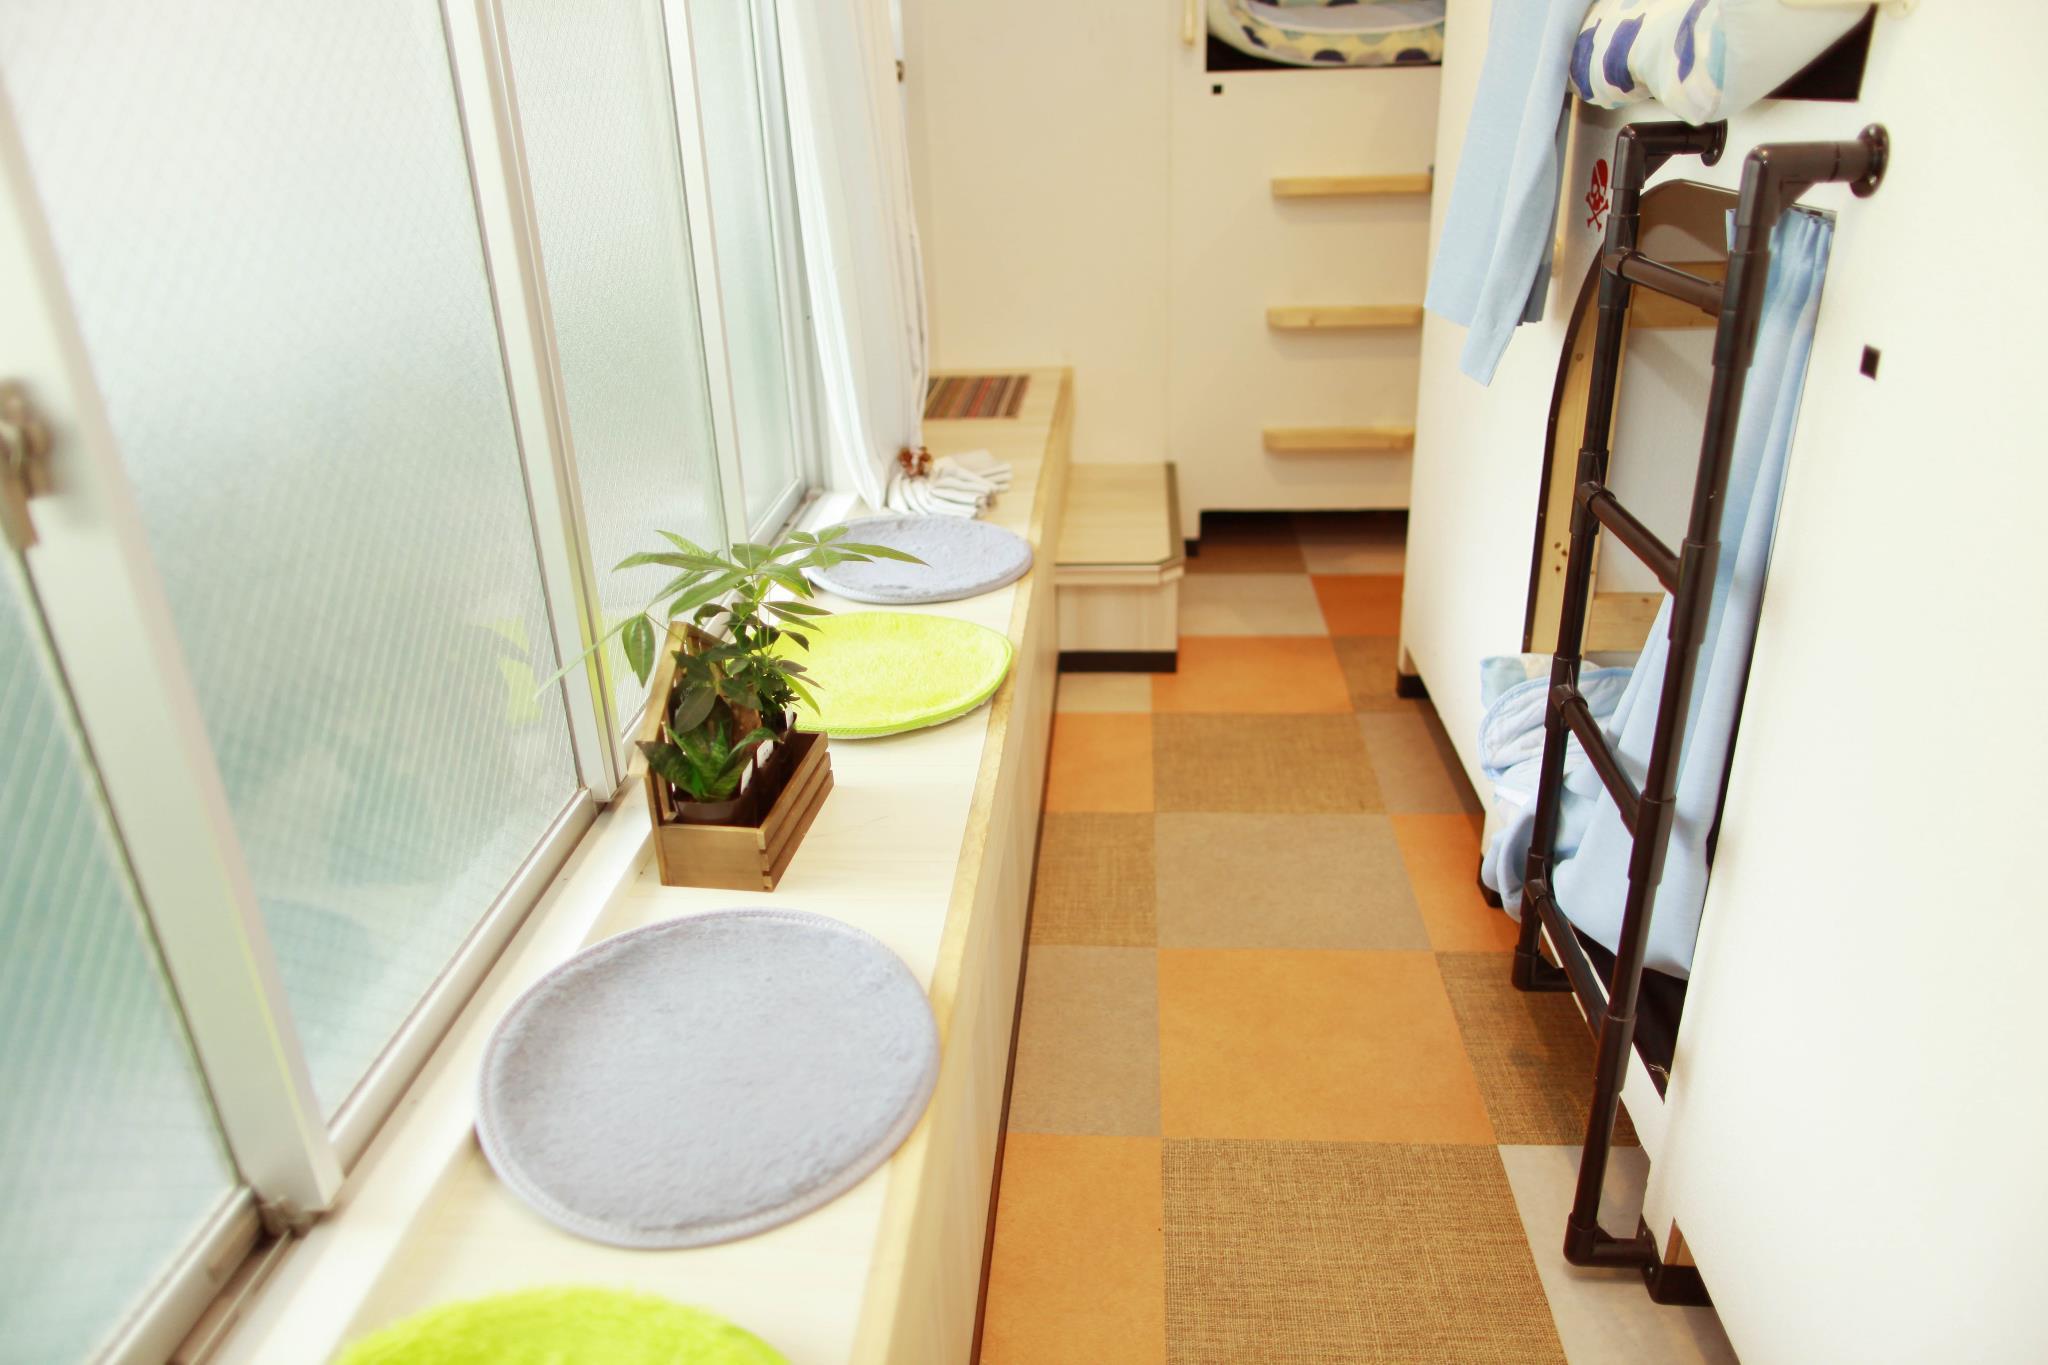 Tokyo Shinjuku Guest House G Inns